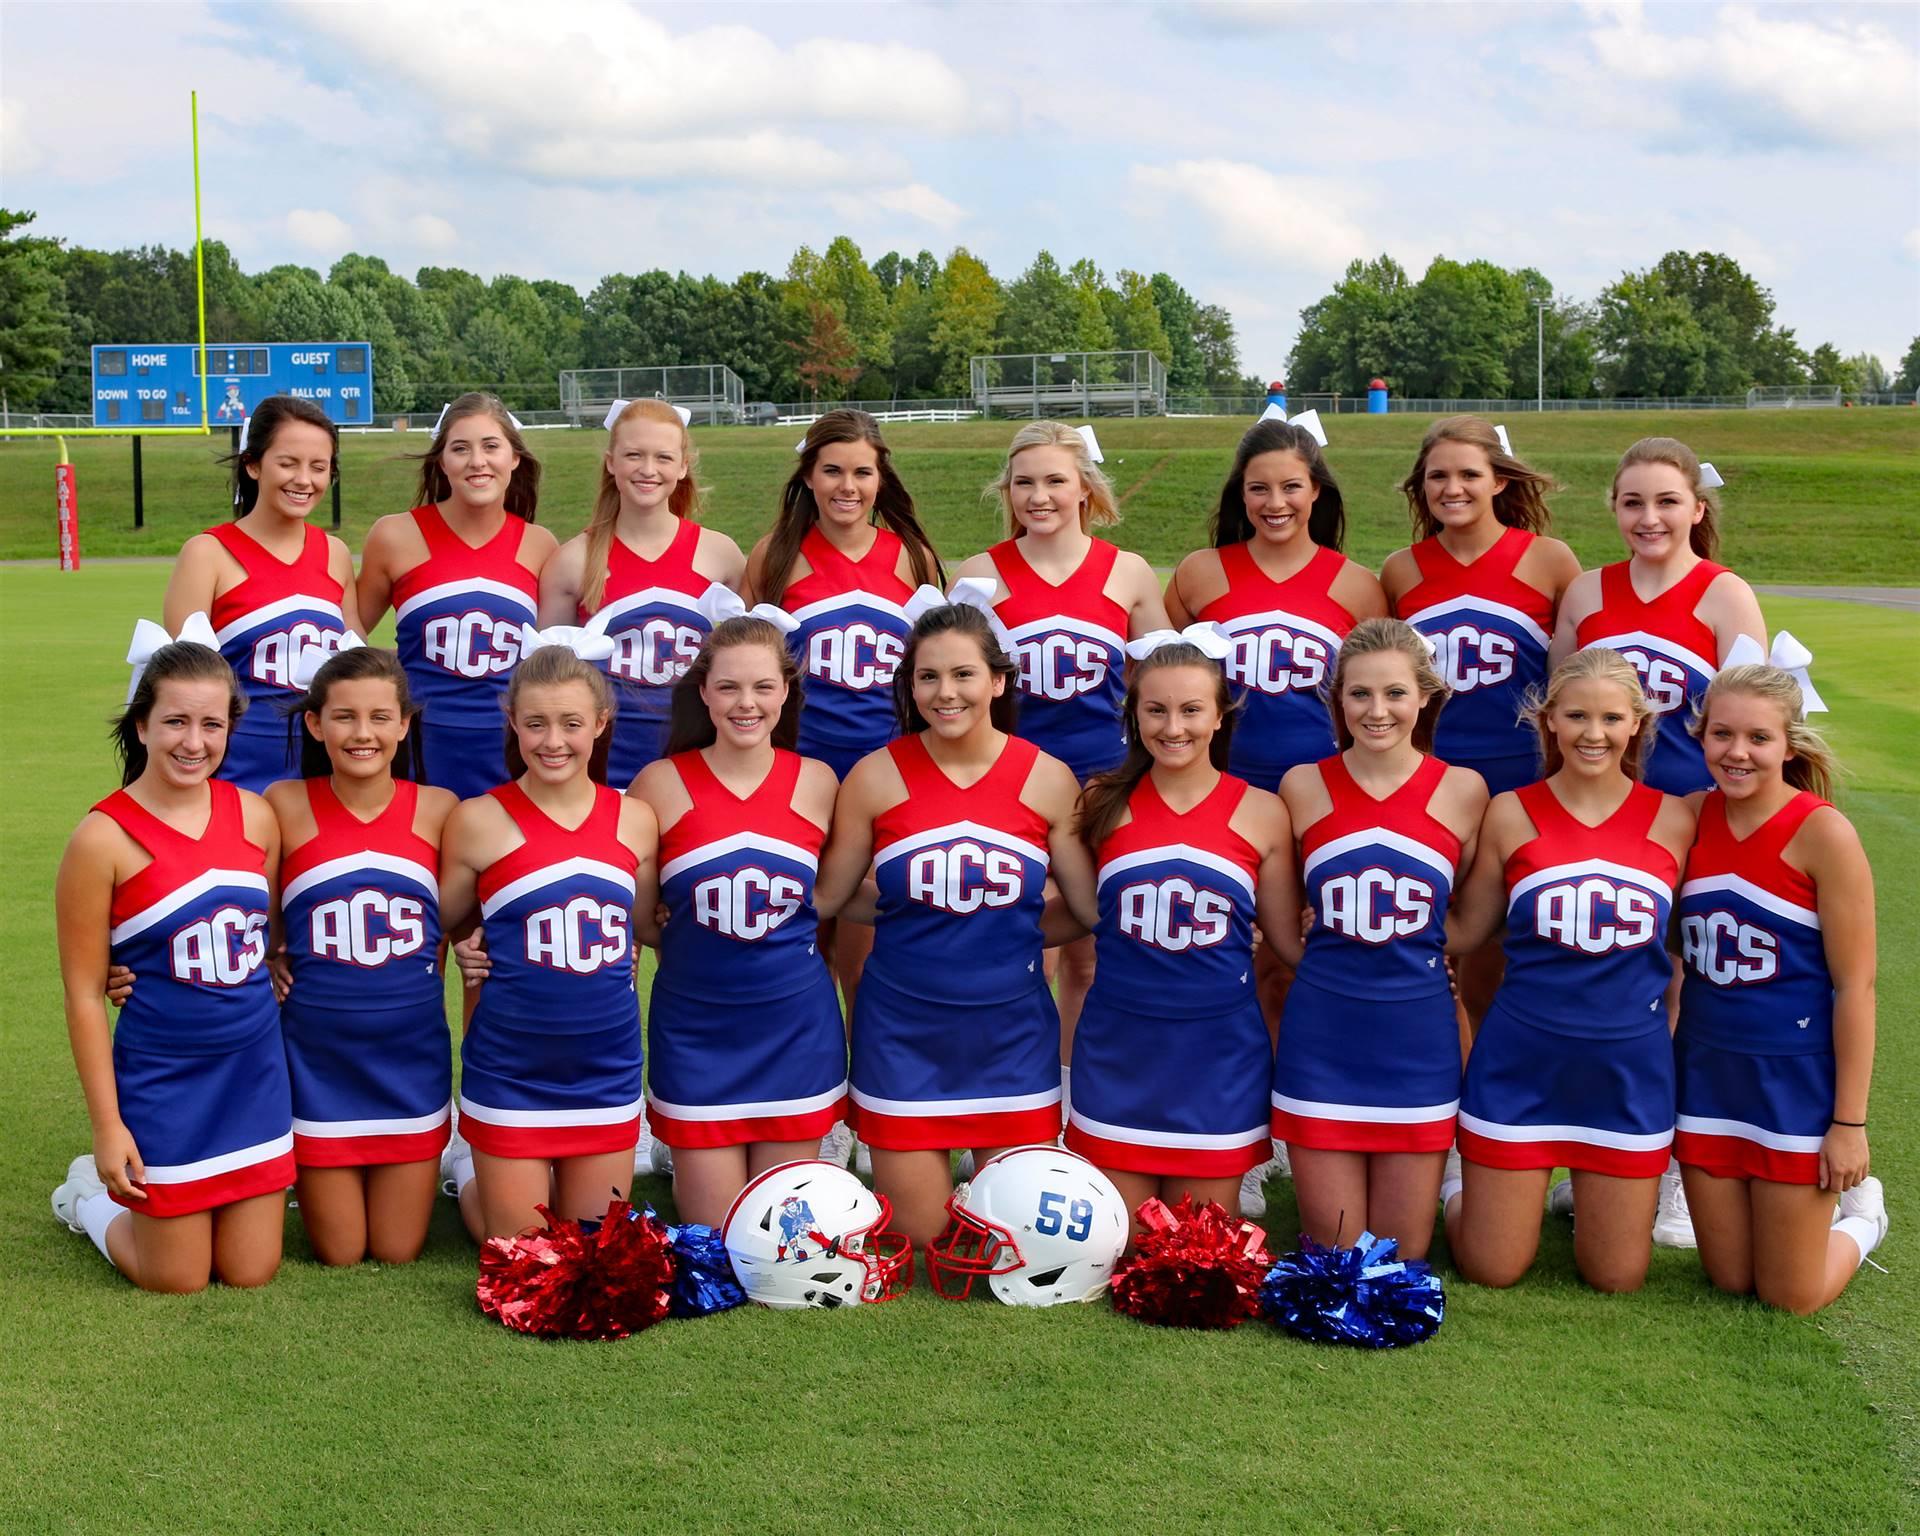 Football Cheerleaders 2017